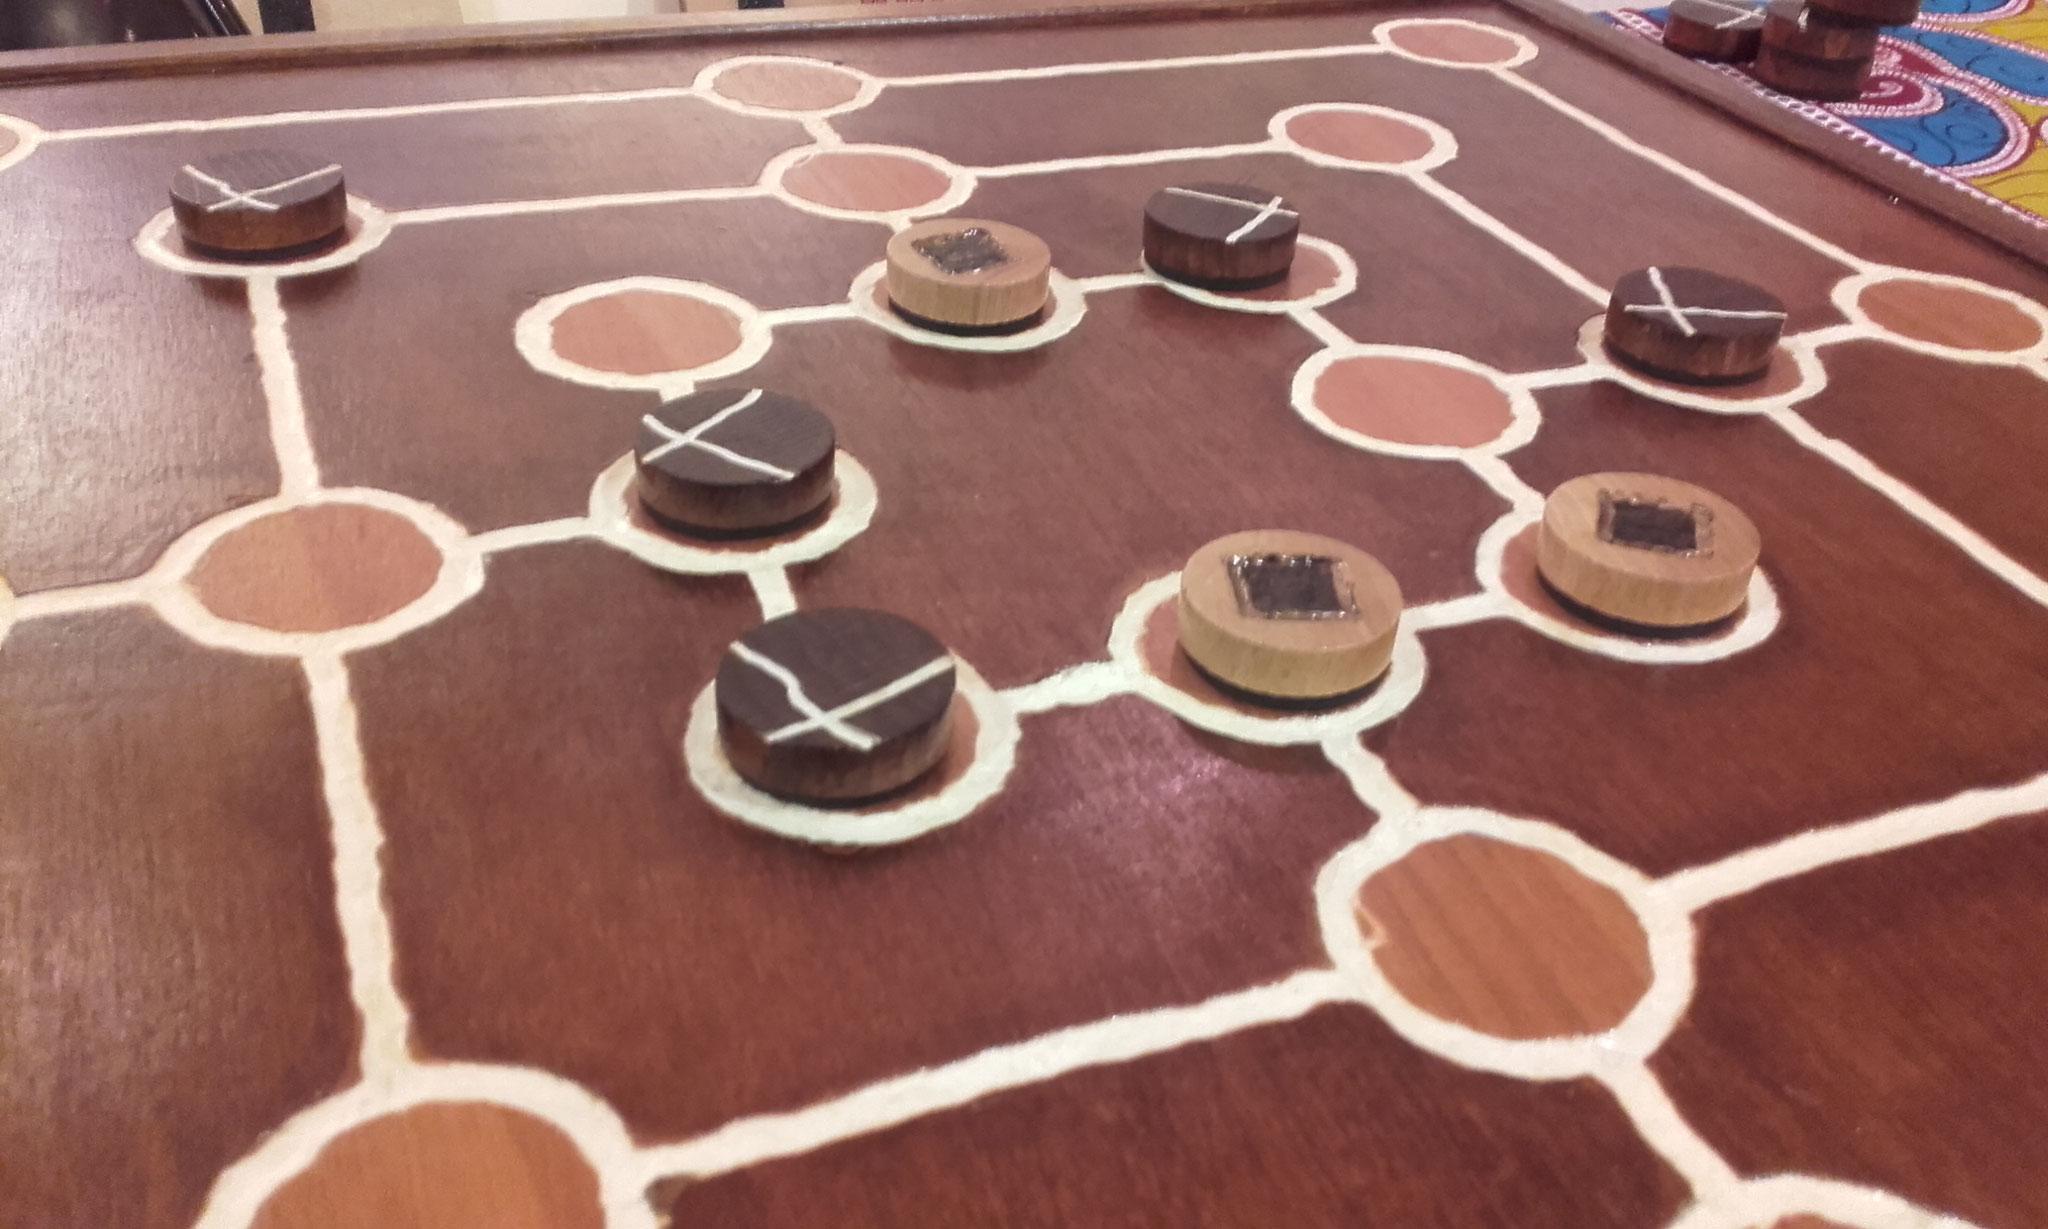 Moulin, jeu européen